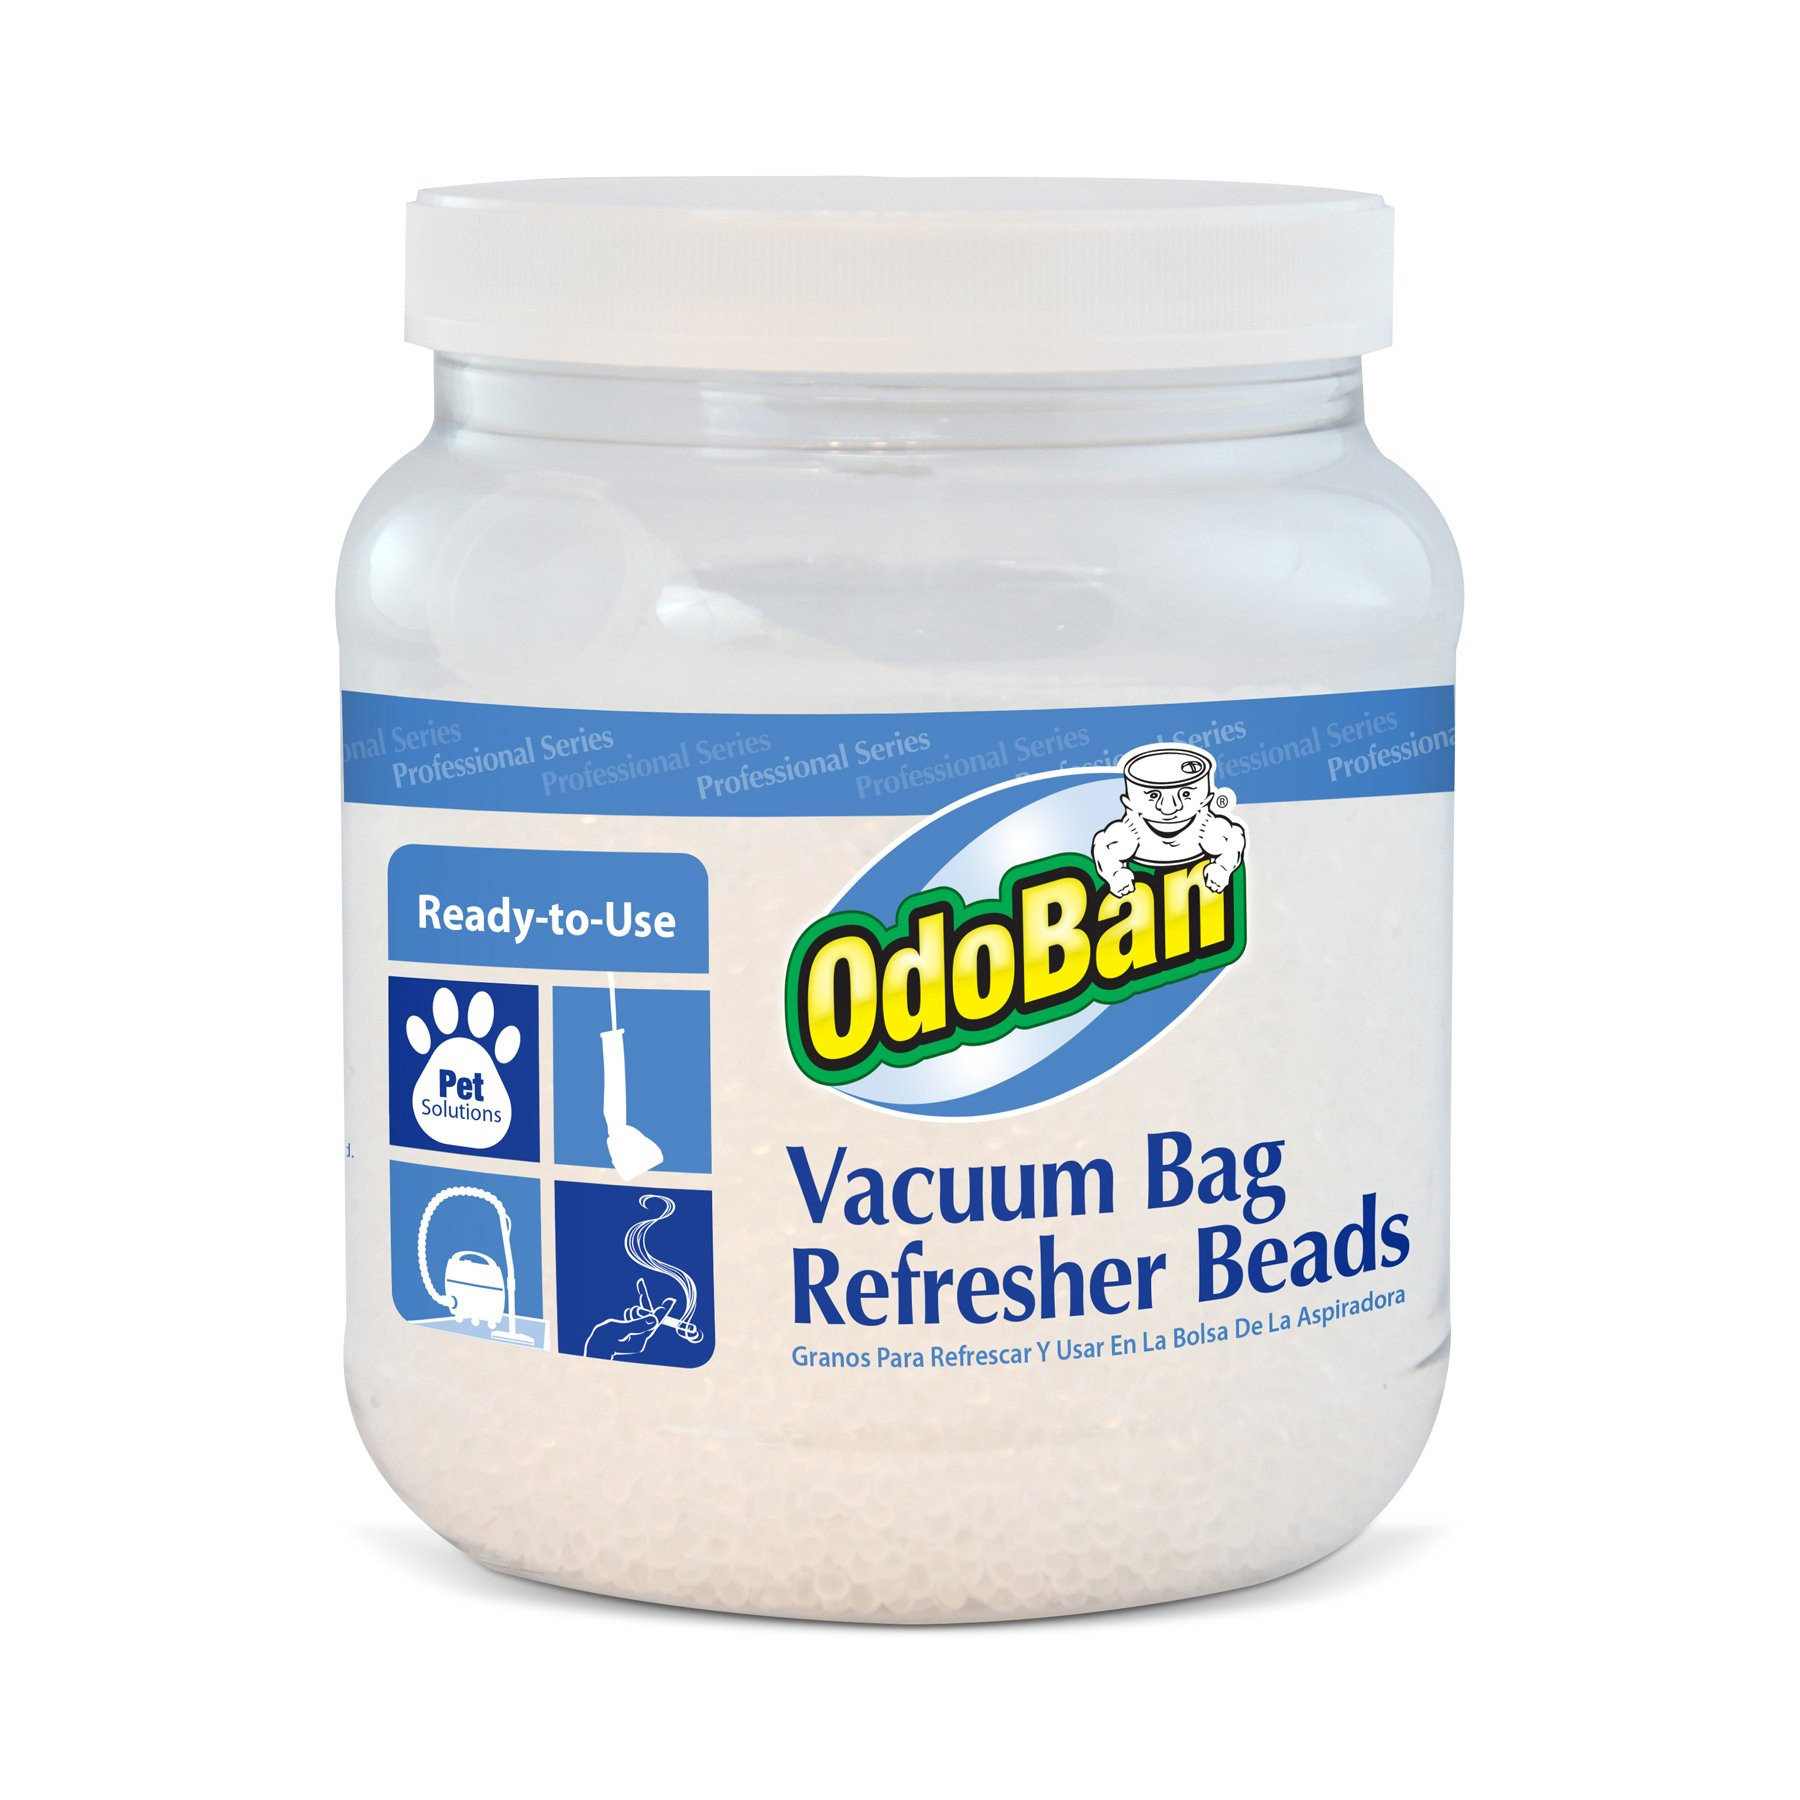 OdoBan 9745A62-24Z Vacuum Bag Refresher Beads, Fresh Scent, 24 oz.